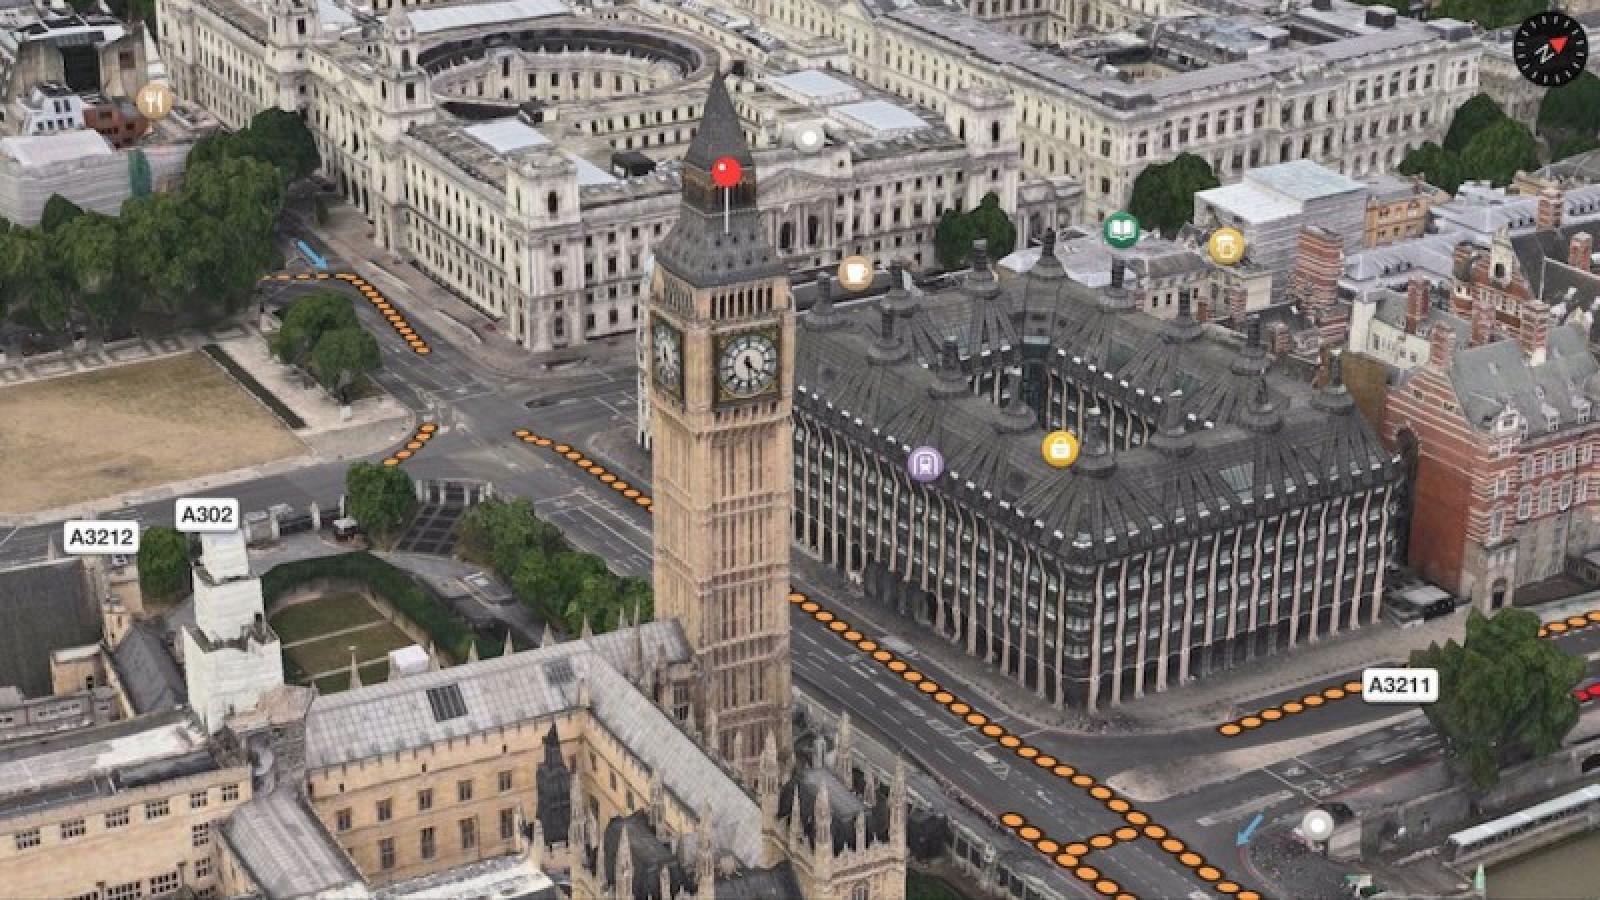 Simple Wallpaper Macbook London - big_ben_clock_apple_maps-800x450  Perfect Image Reference_356970.jpg?retina